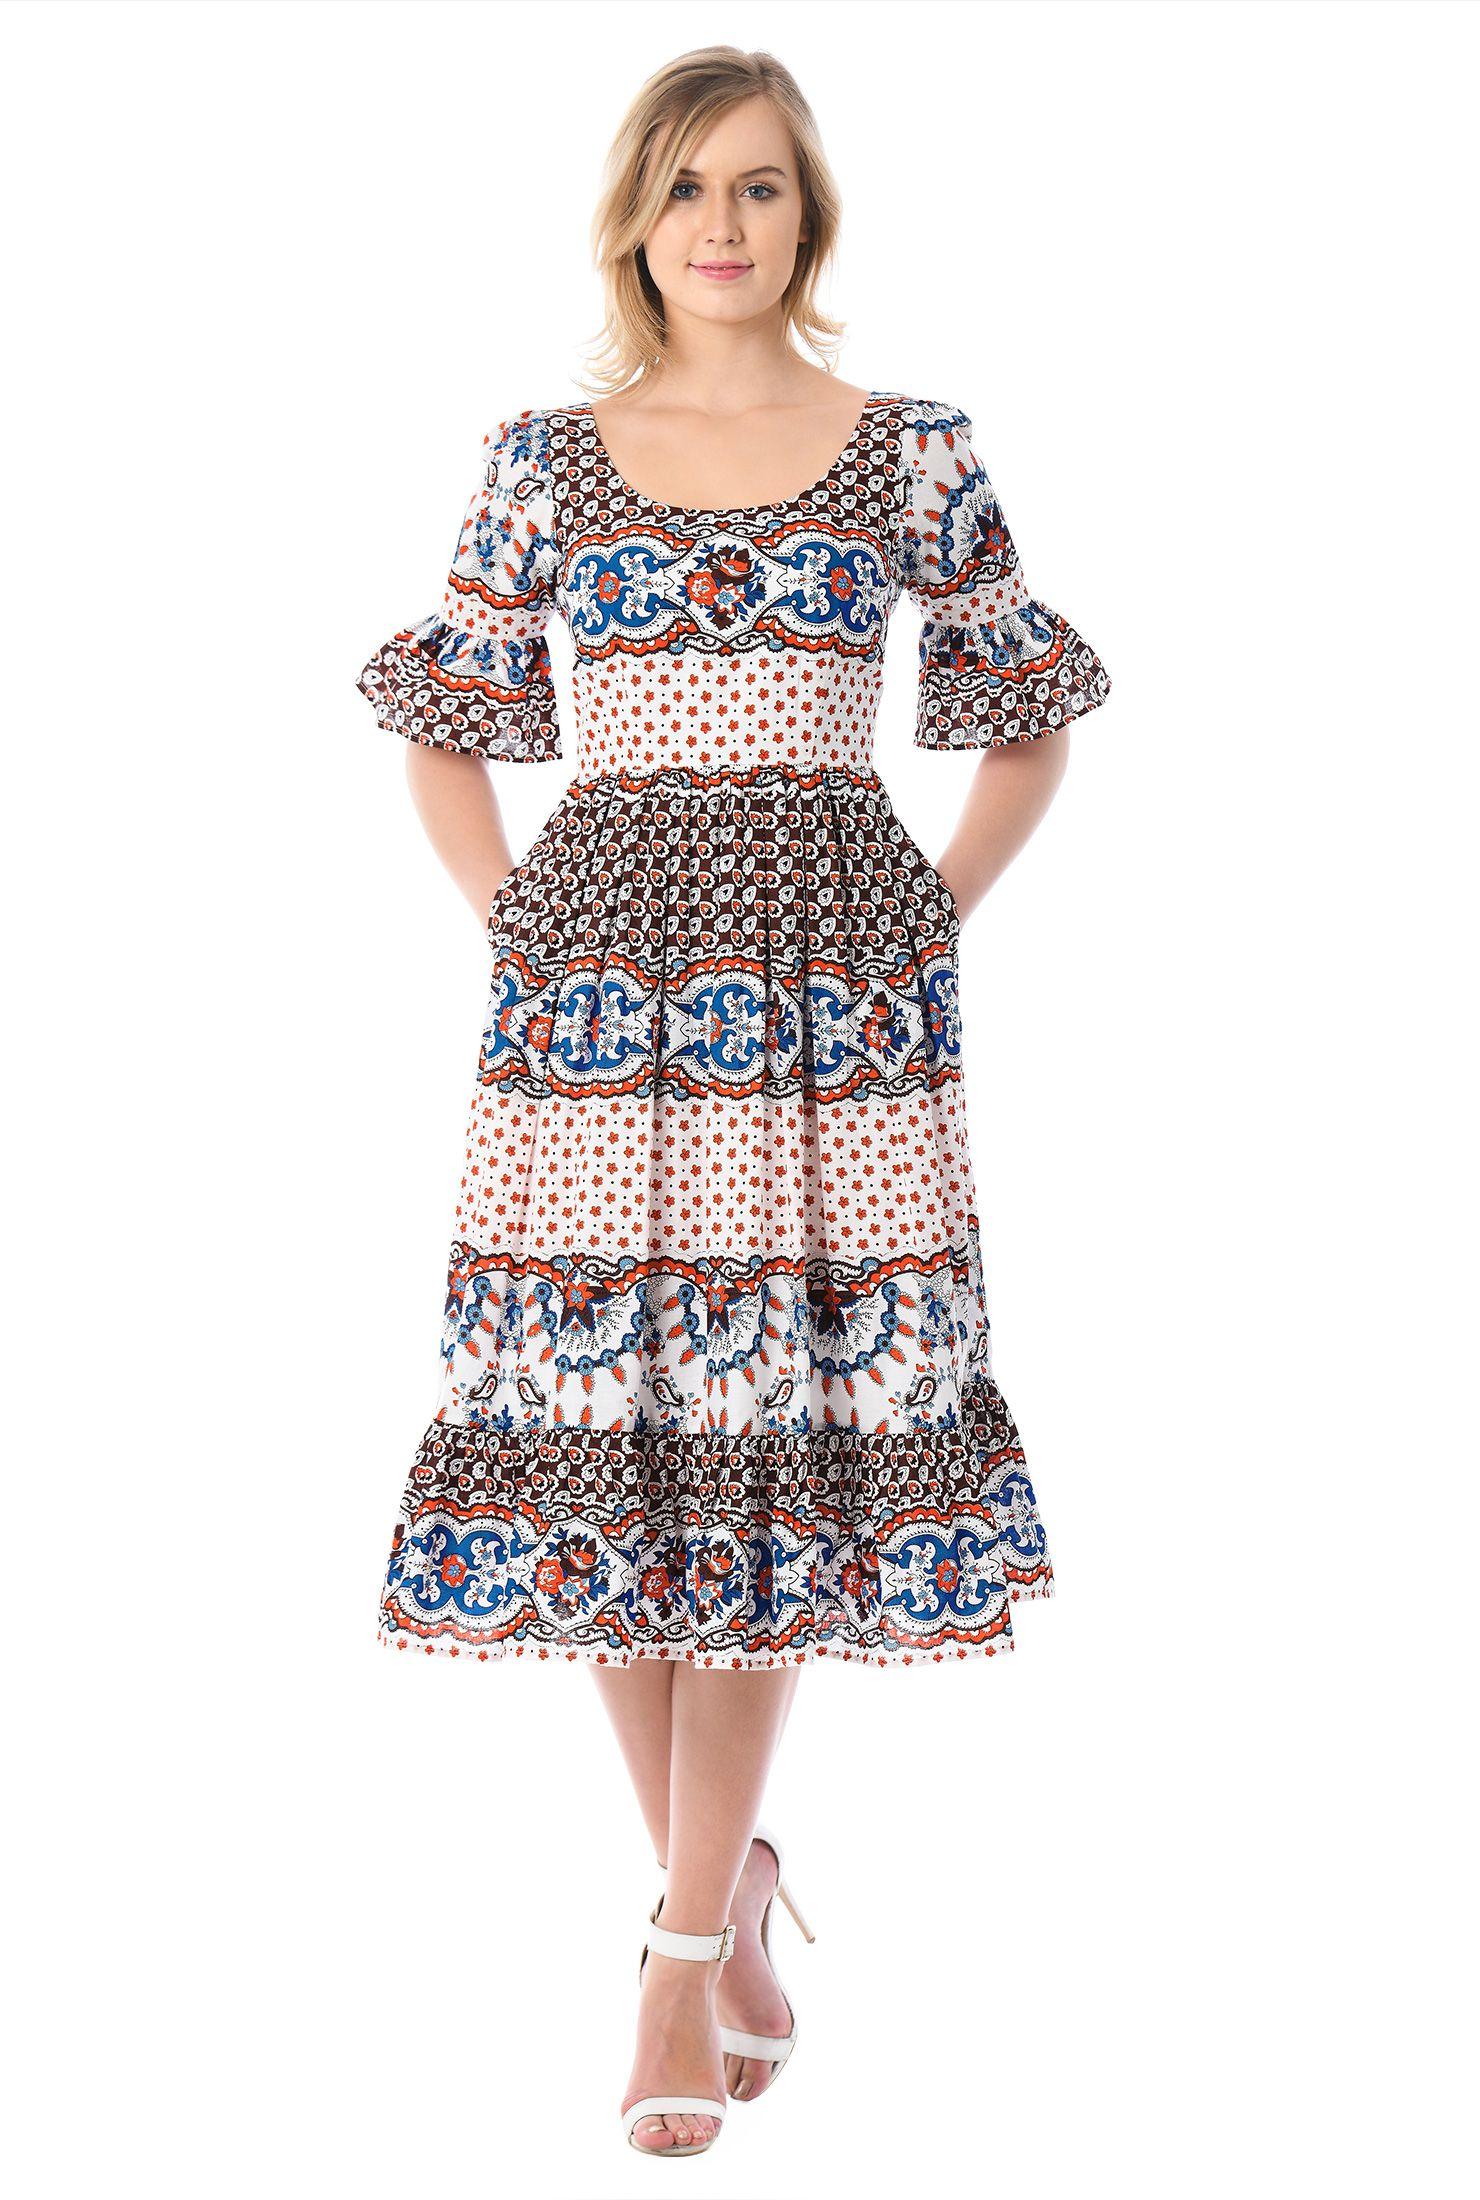 Cotton Dresses Elbow Sleeve Dresses Lightweight Dresses Machine